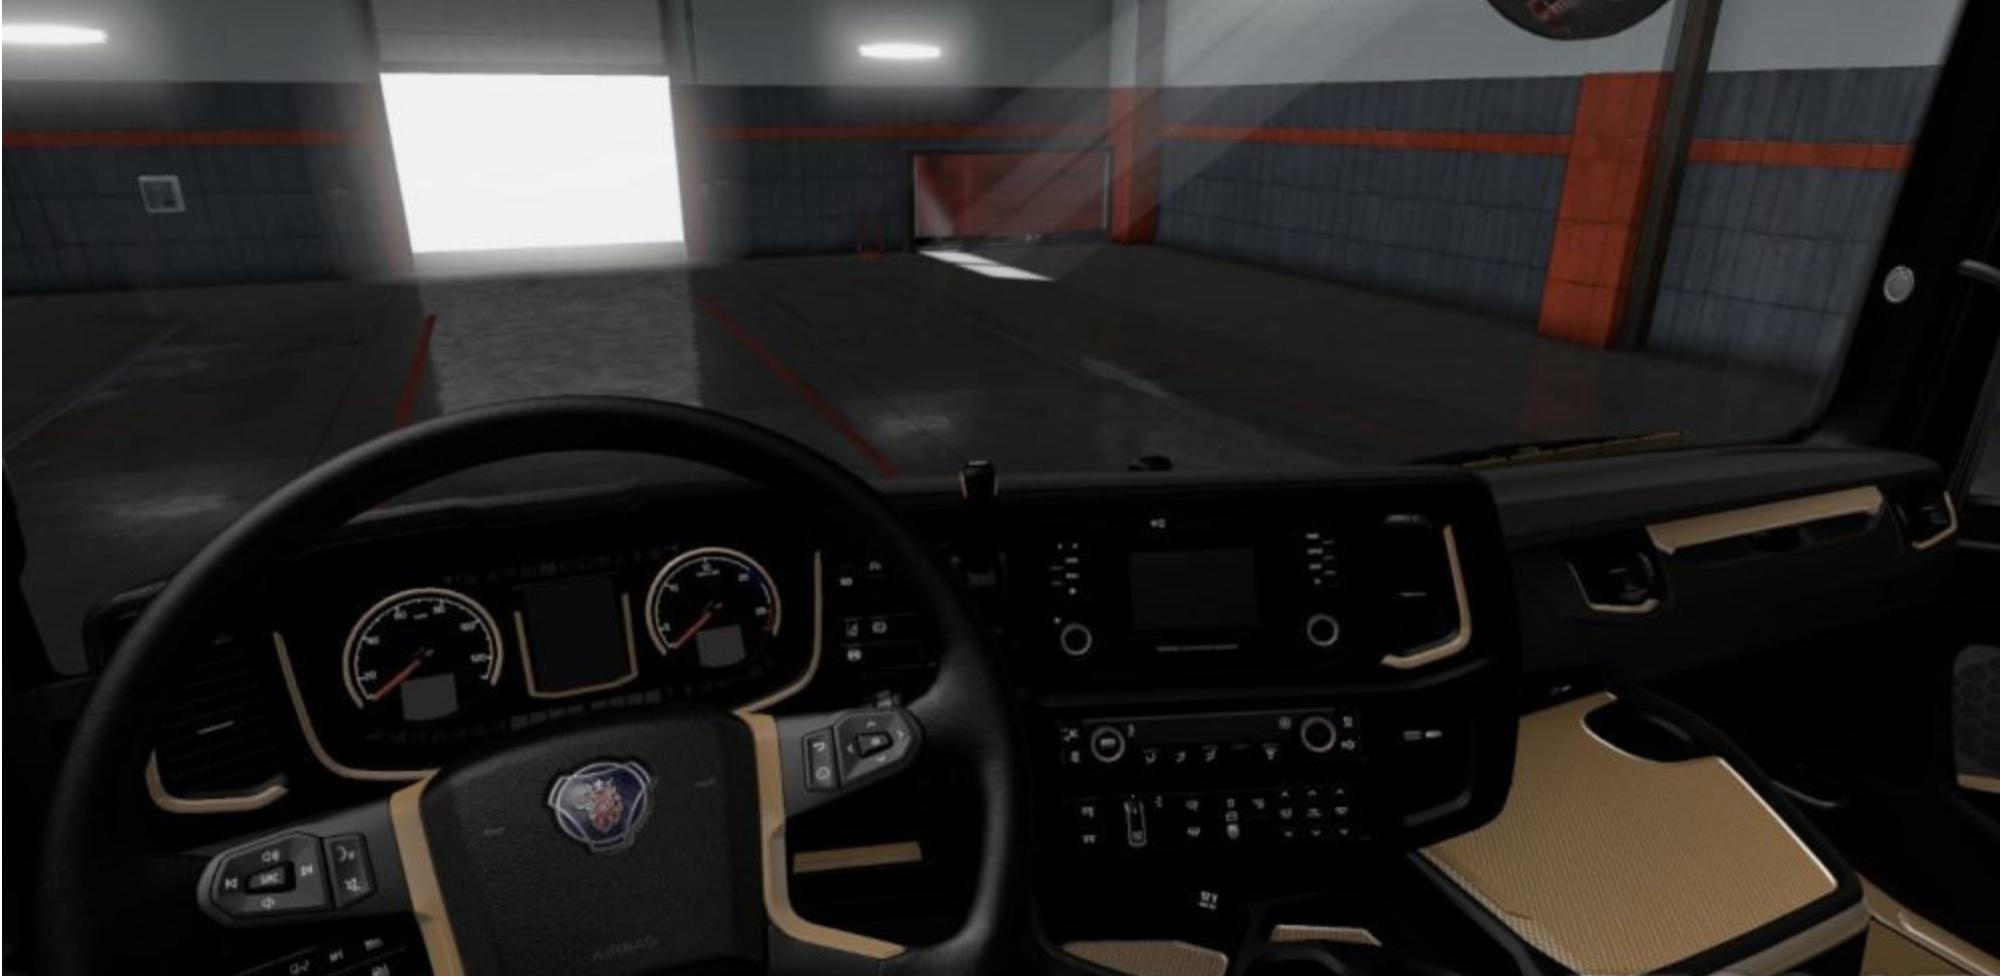 ETS2 - Scania S & R 2016 Black - Brown Interior (1.36.x)